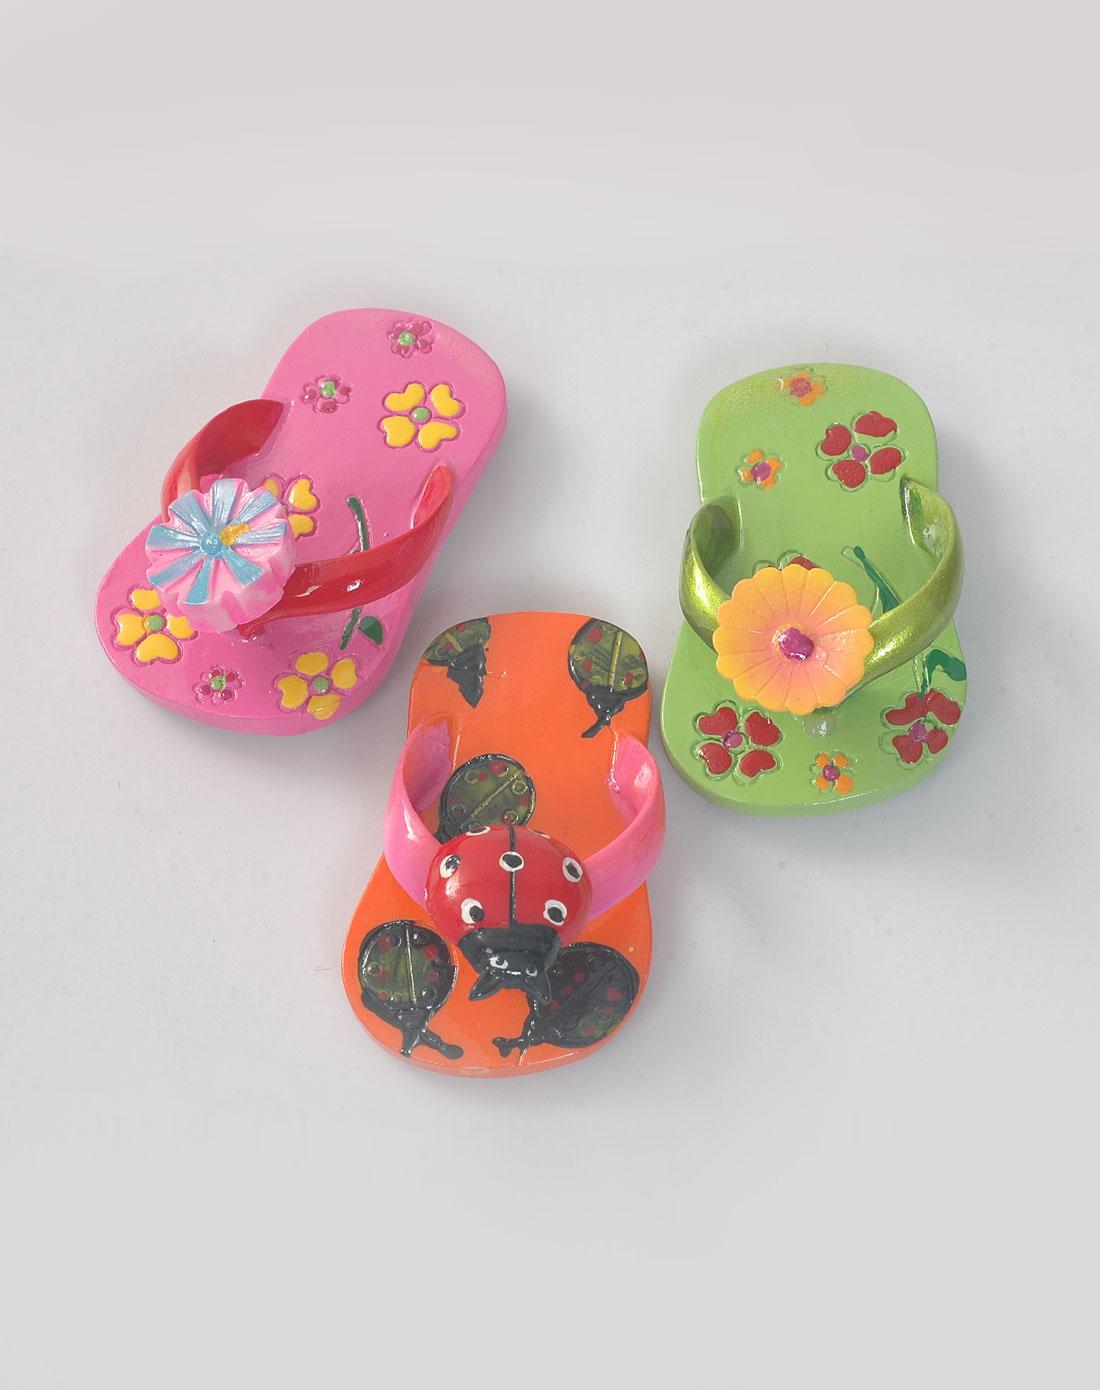 jm创意冰箱贴(拖鞋)3件装(五彩)